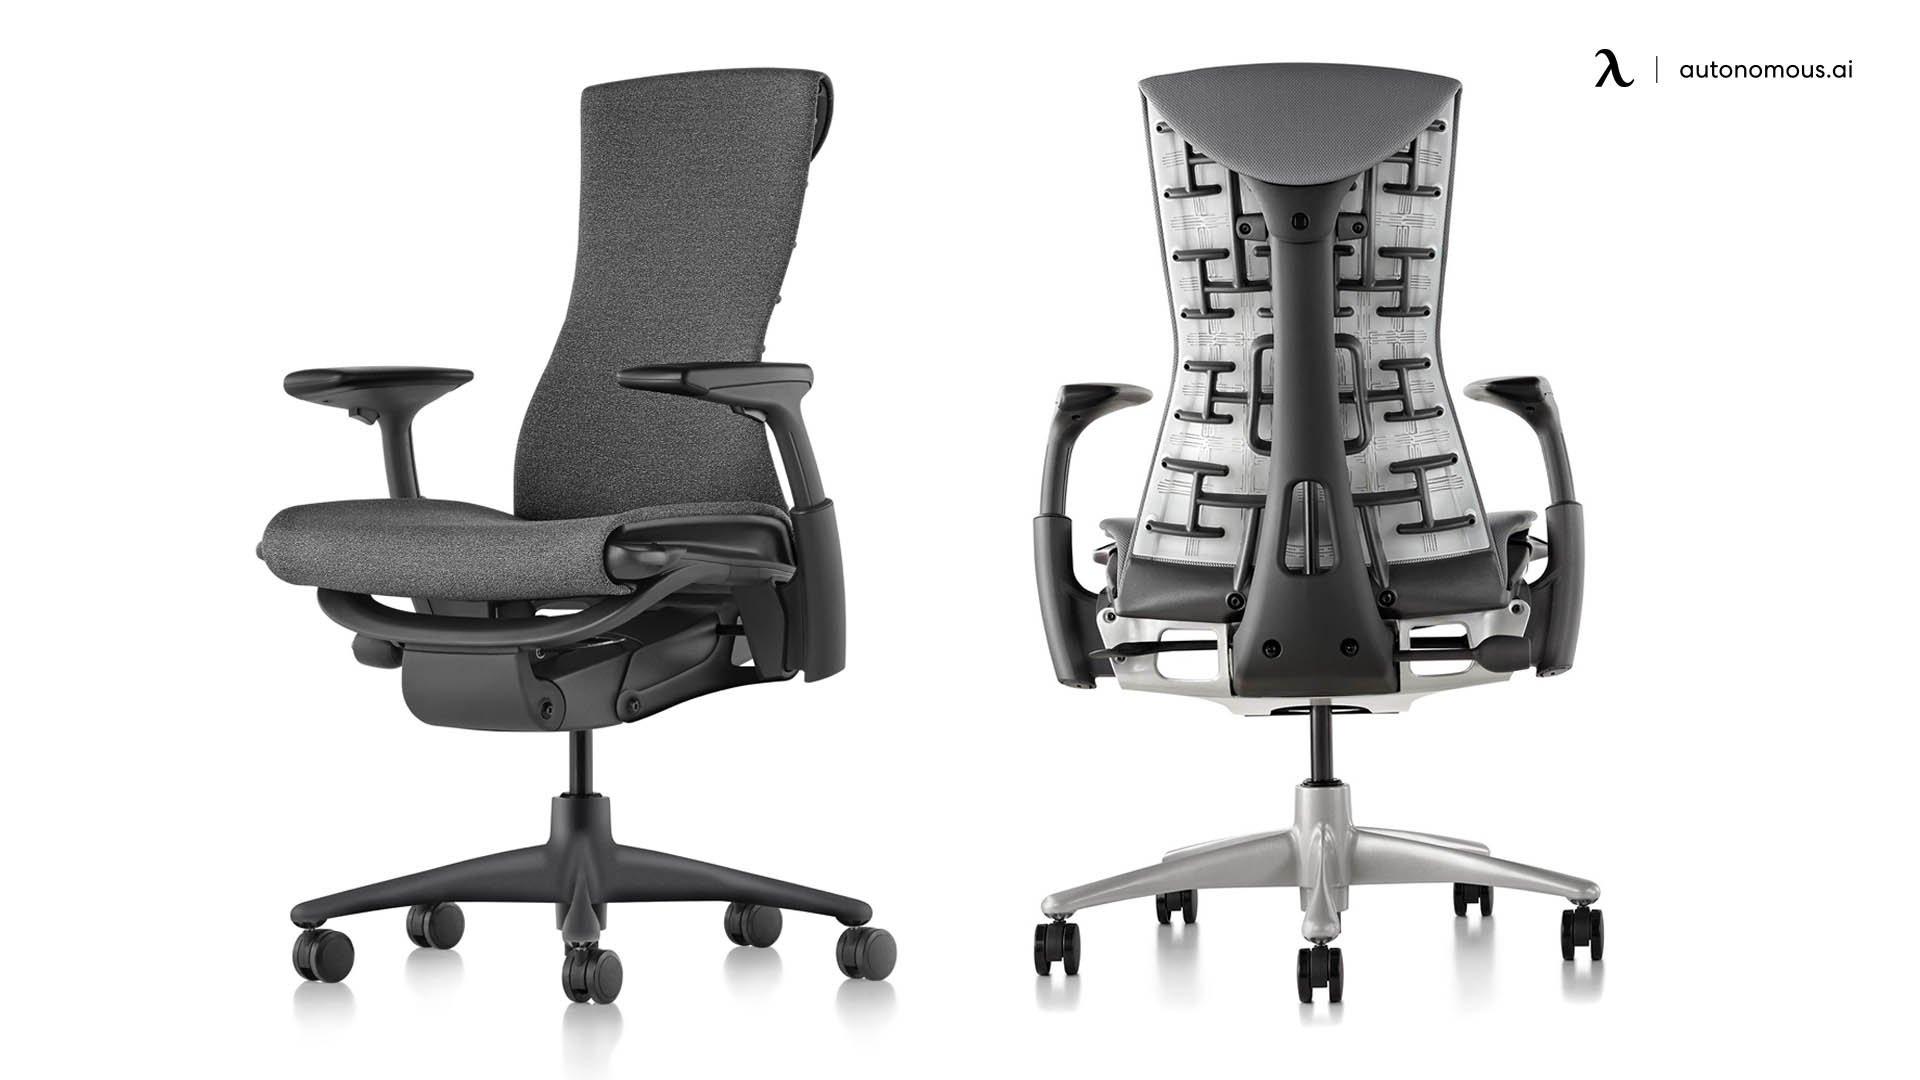 Embody Chair by Herman Miller